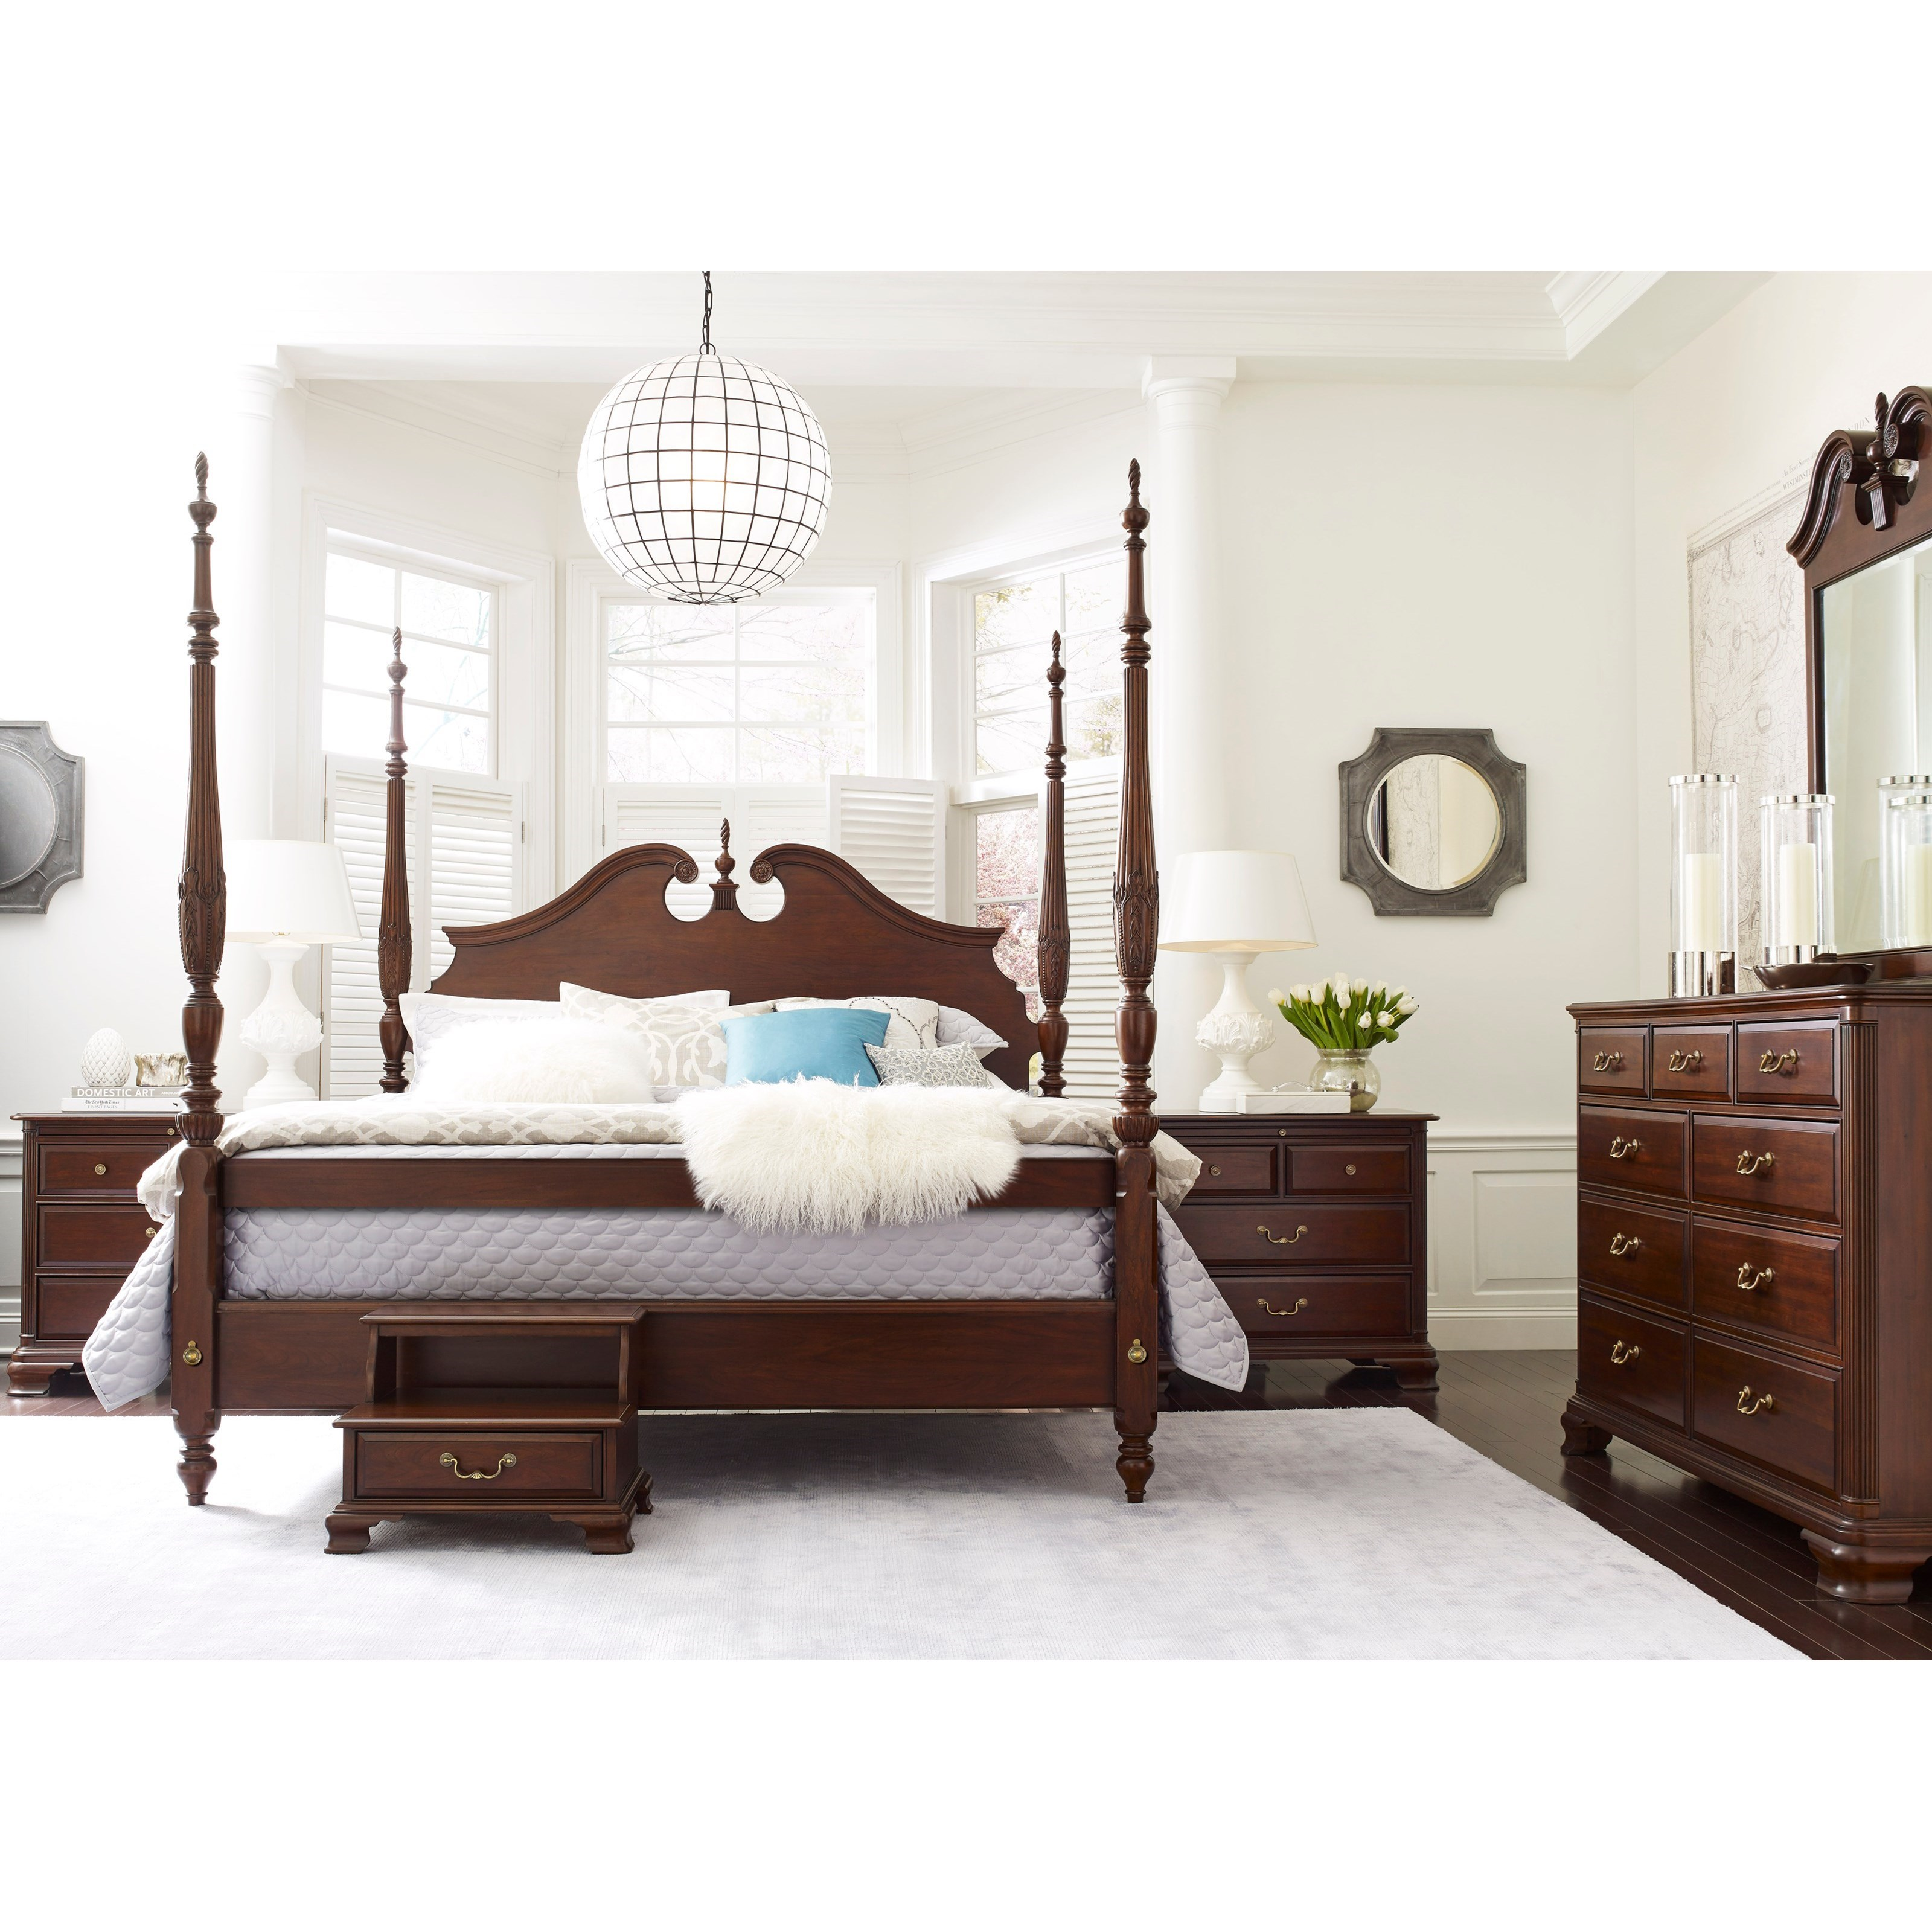 Kincaid furniture hadleigh 607 327p california king rice for Kincaid furniture